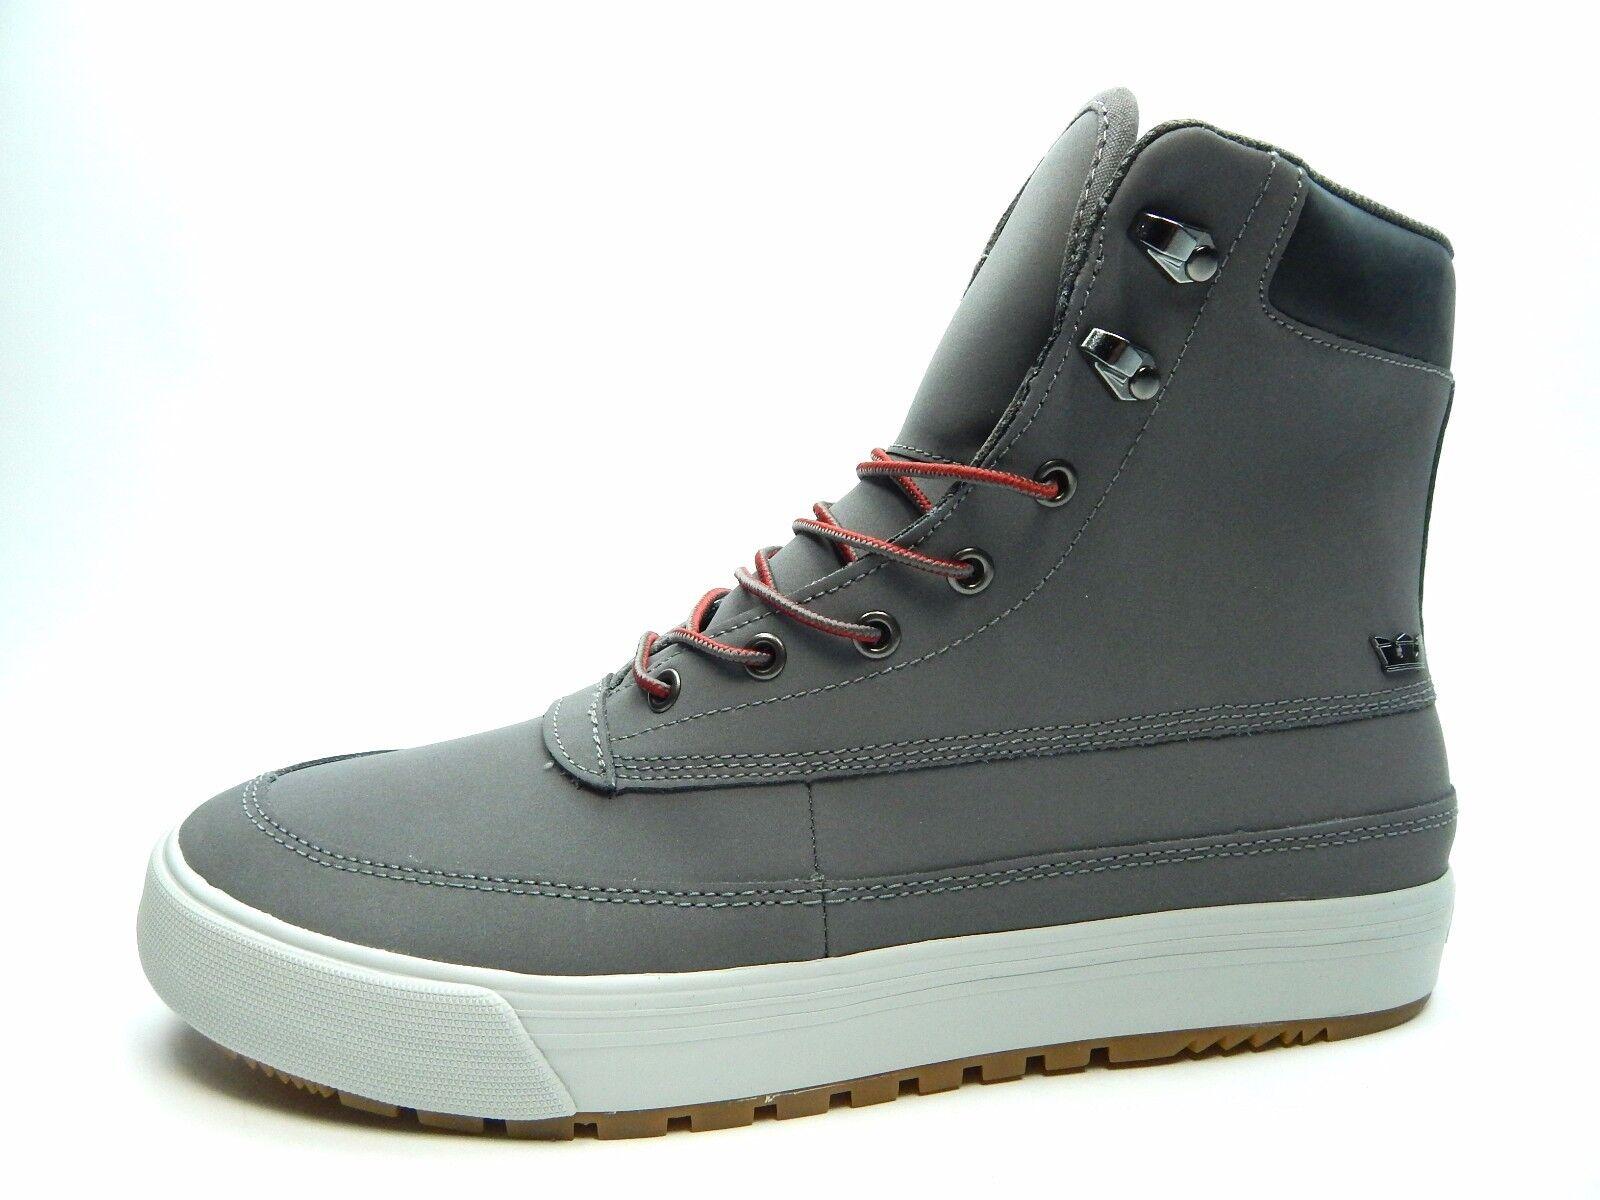 SUPRA OAKWOOD gris gris púrpuraa 08069-048 Hombres Zapatos